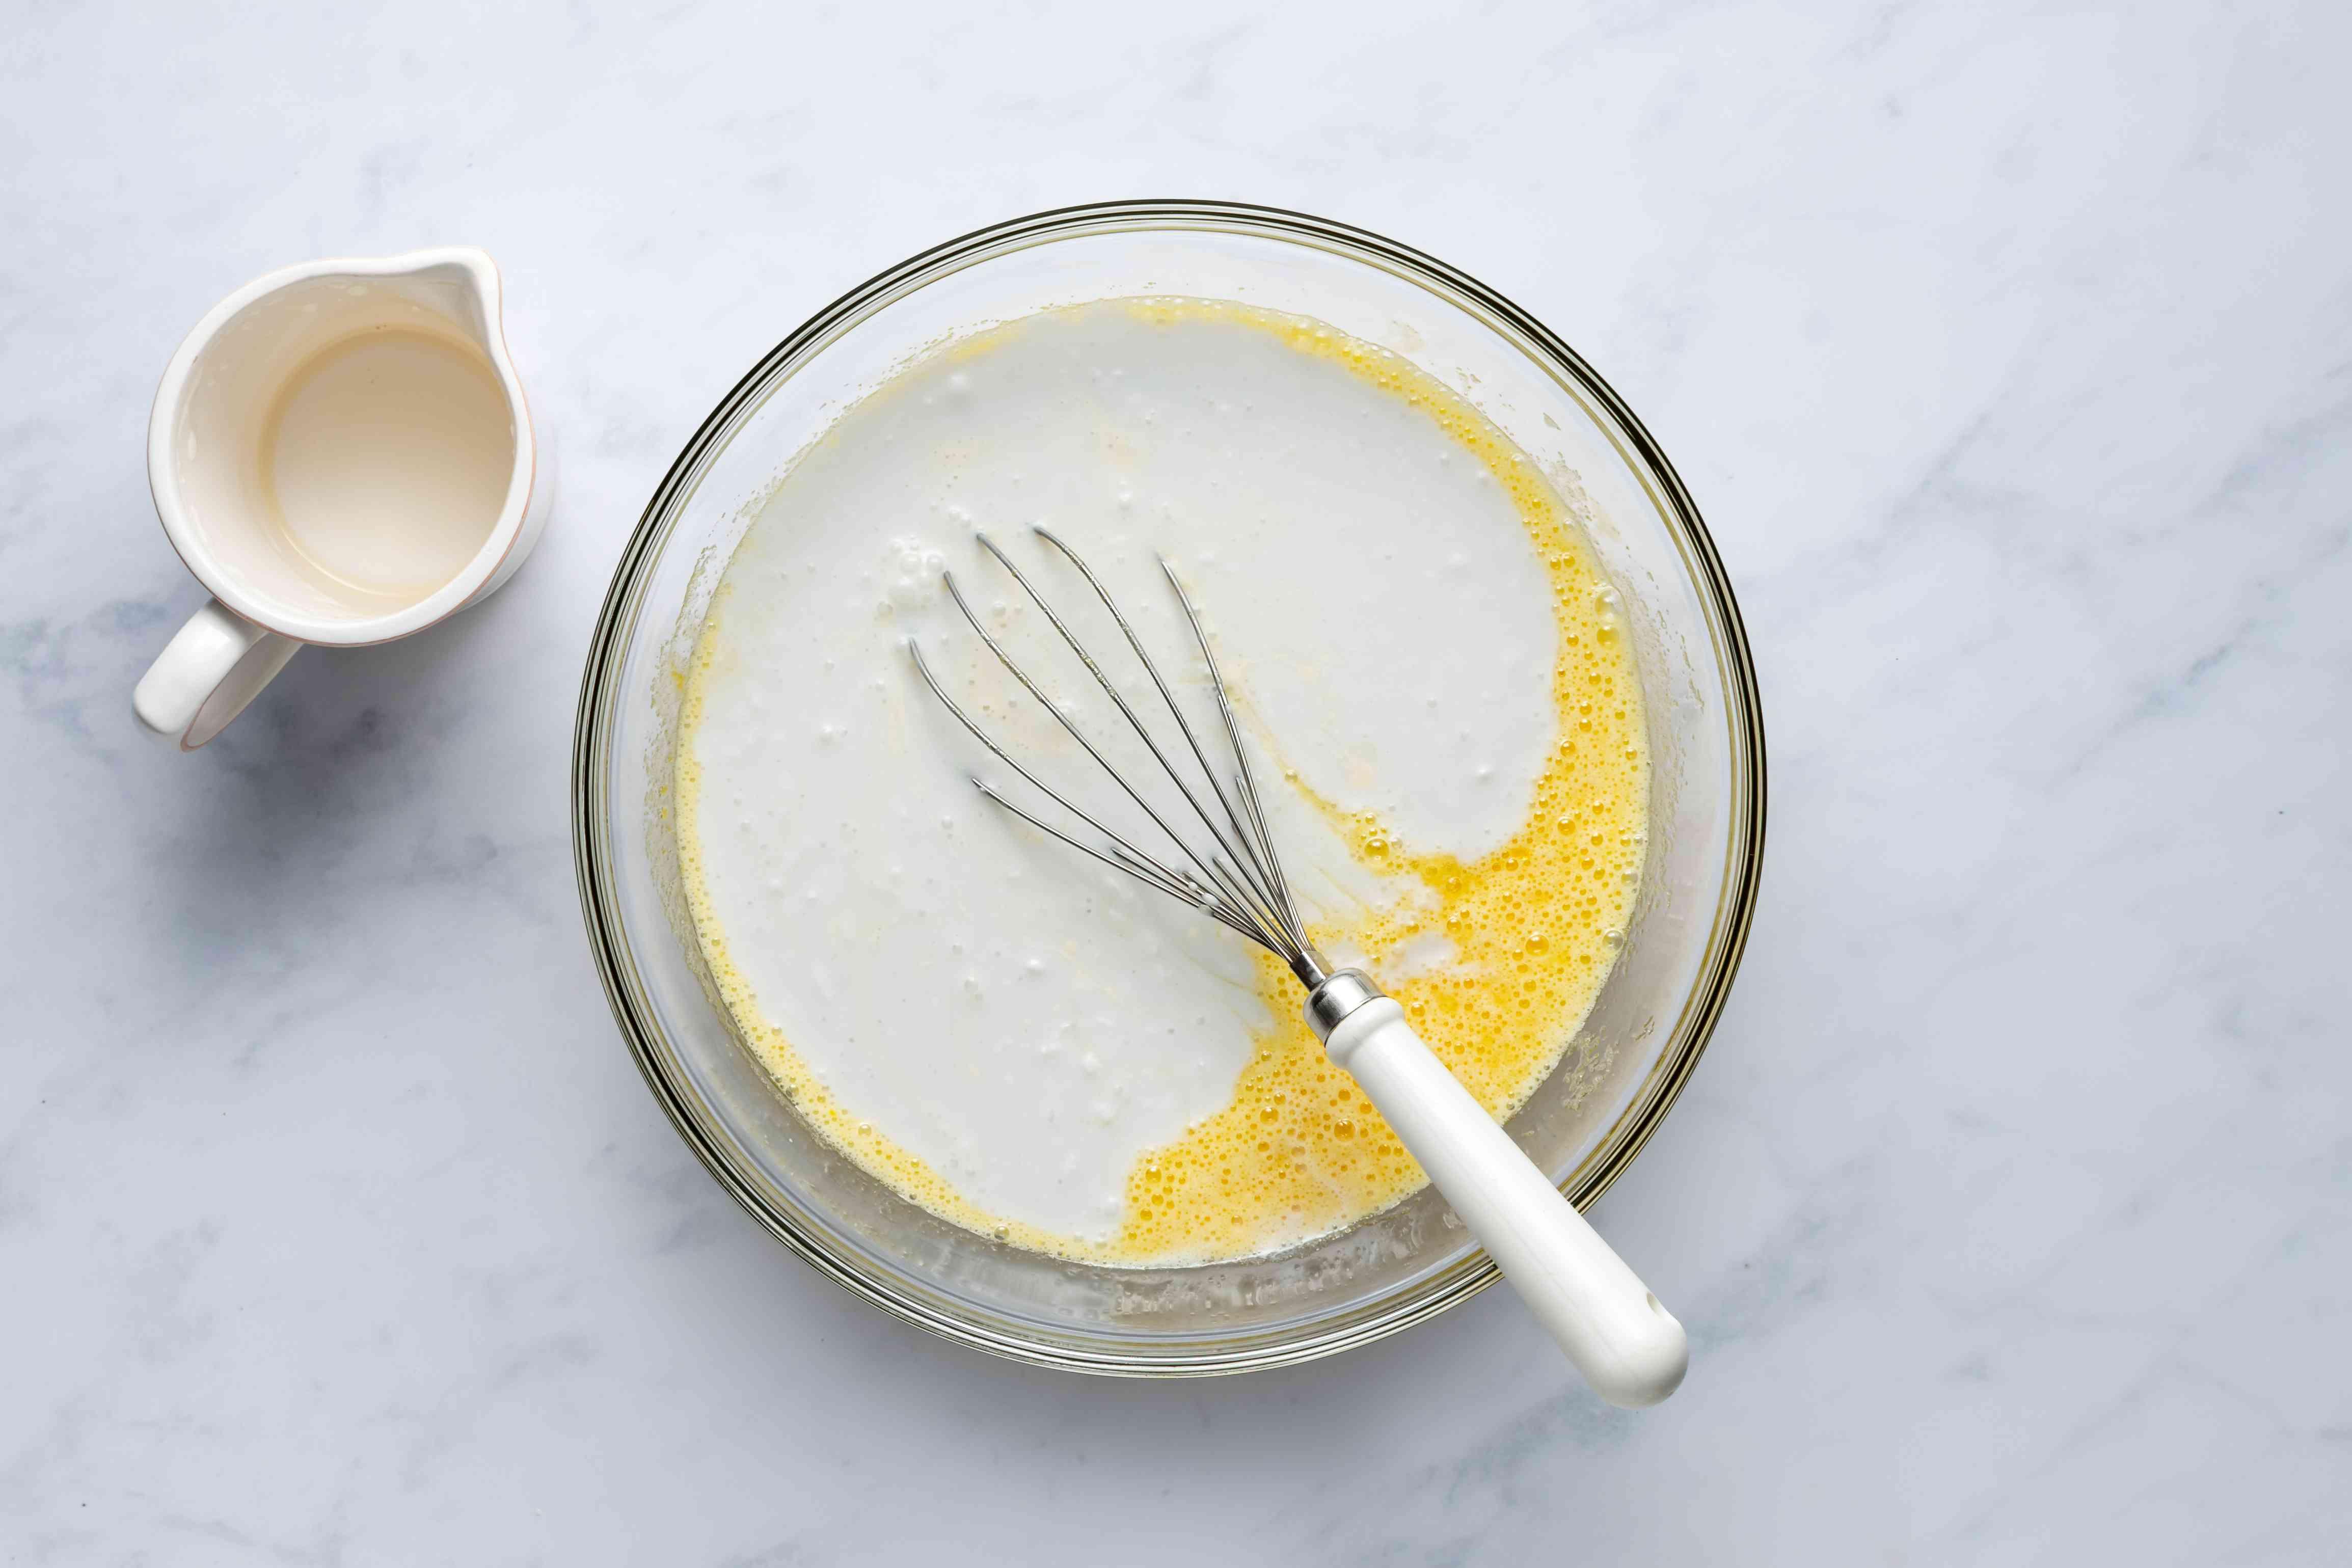 Whisk in butter for mochi cake